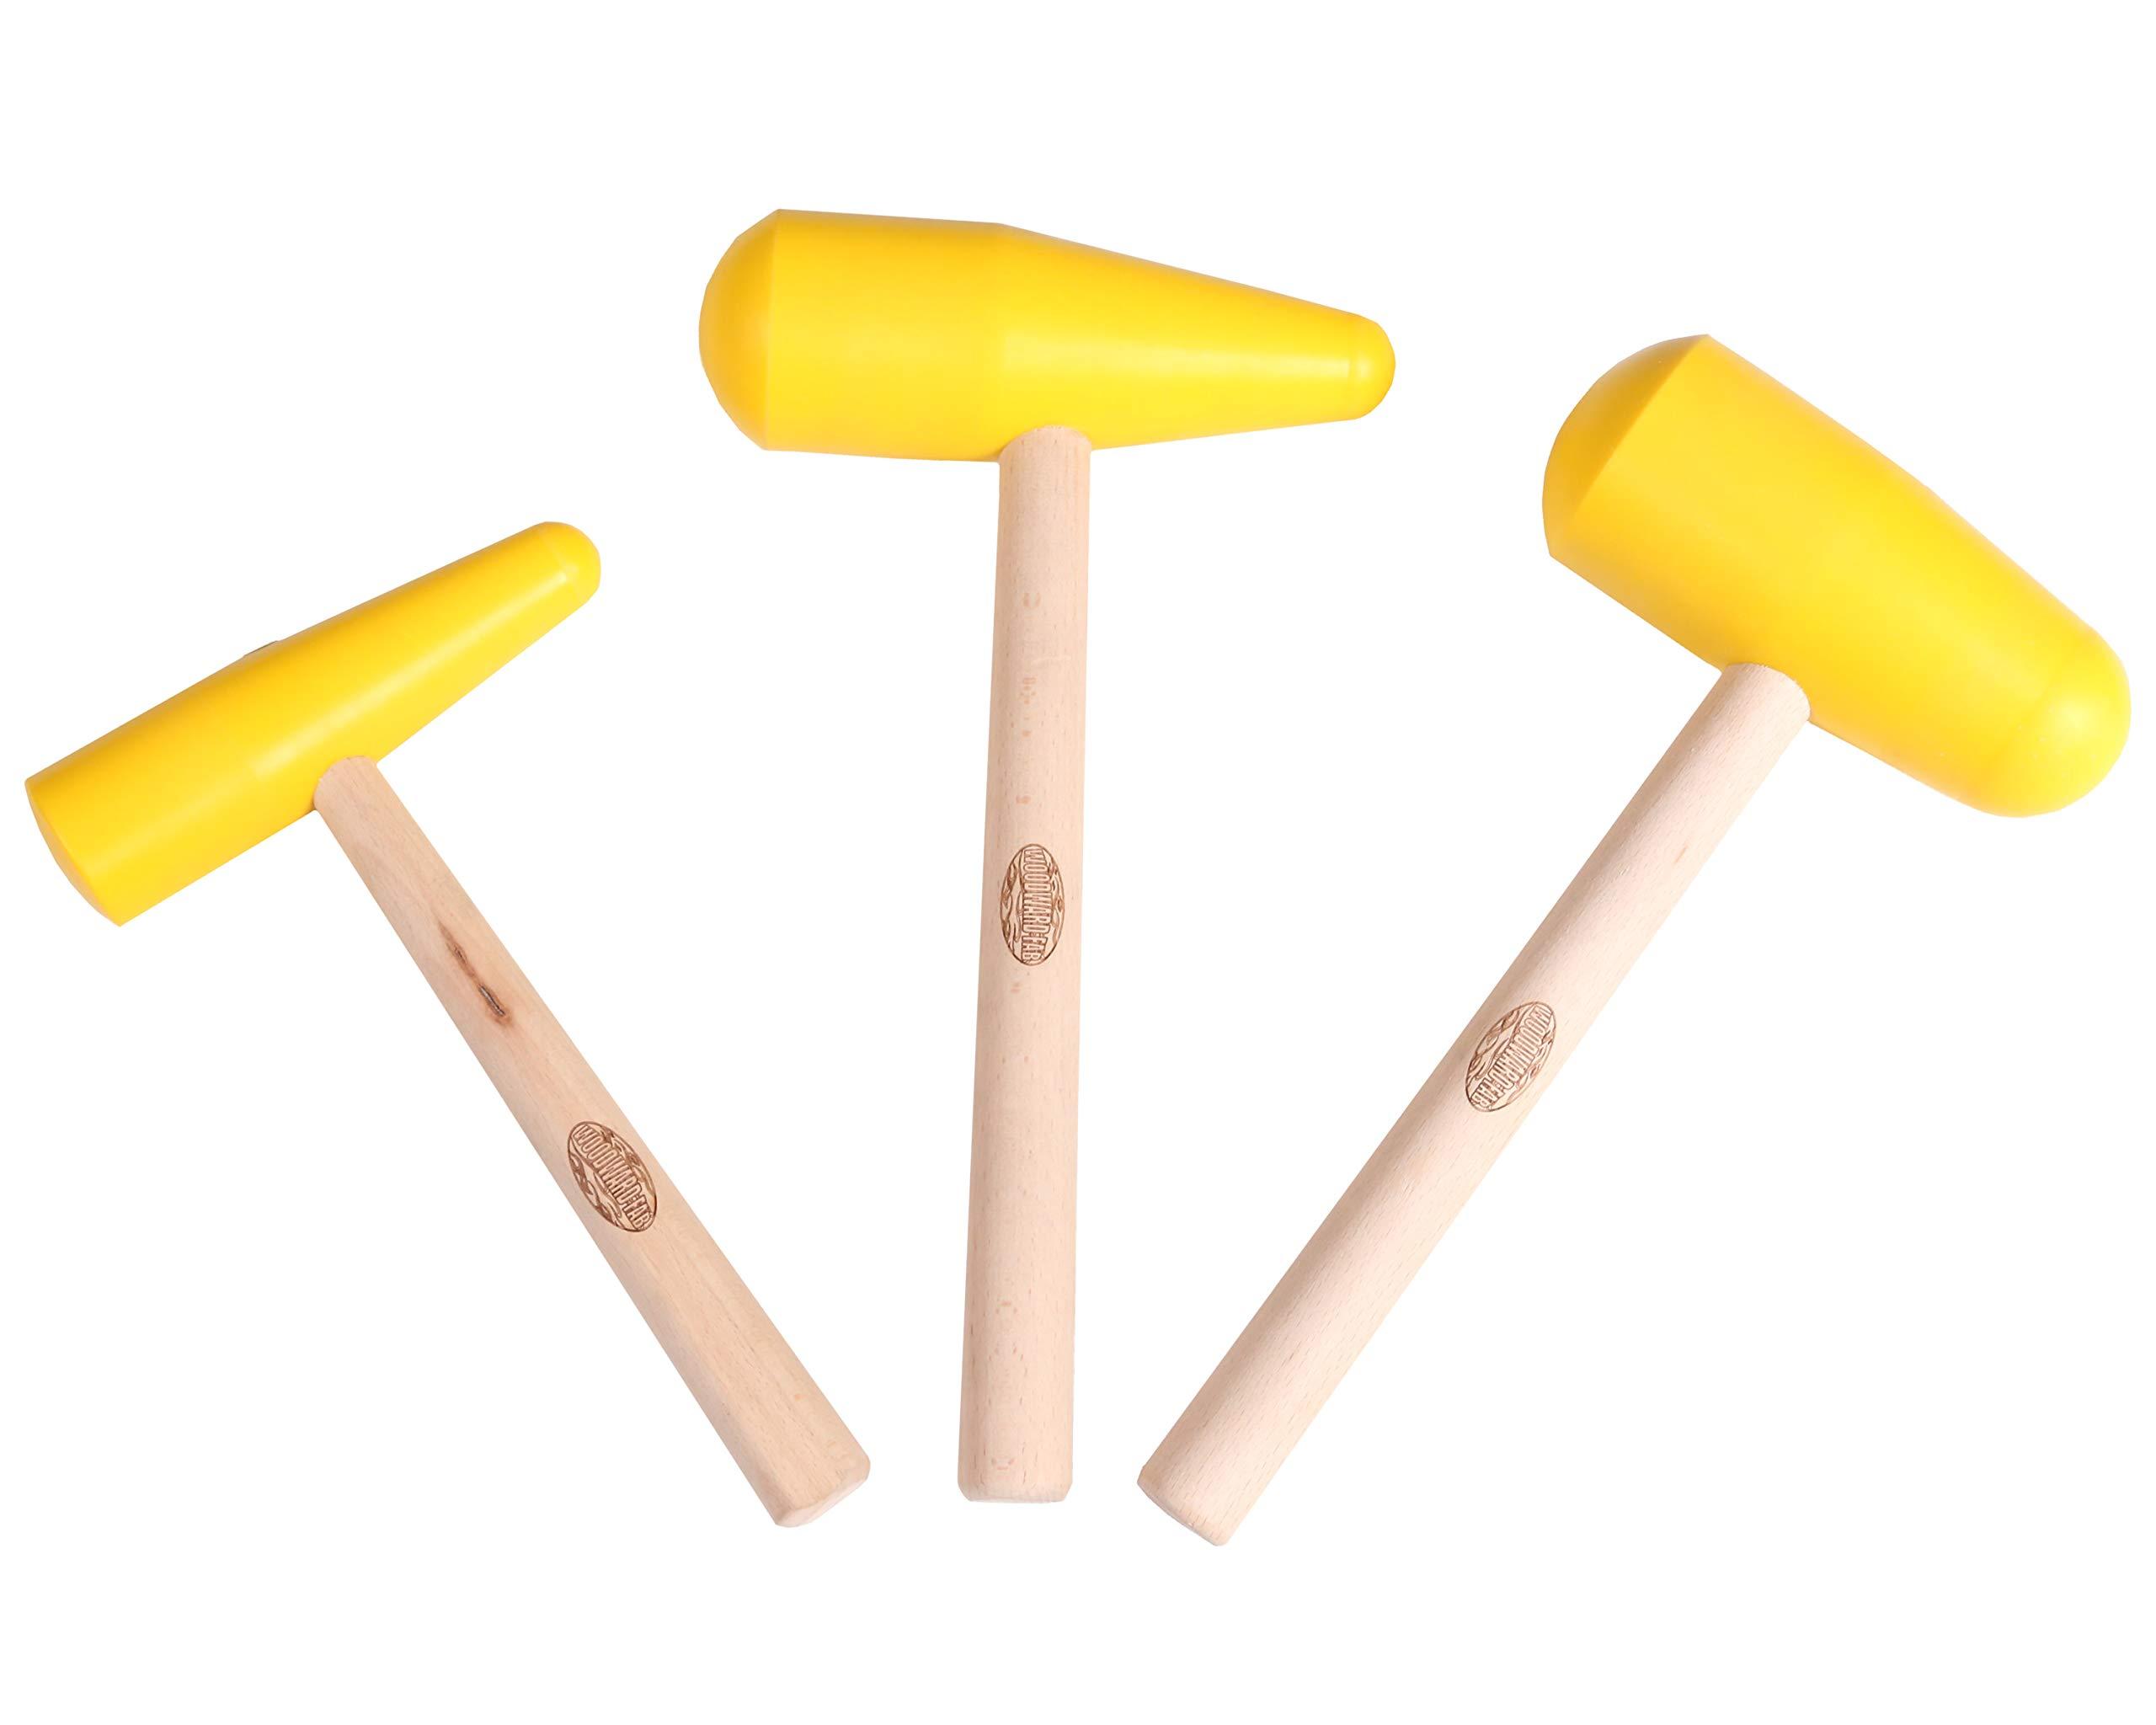 Woodward-Fab Nylon Bossing Mallet 3 pieces set